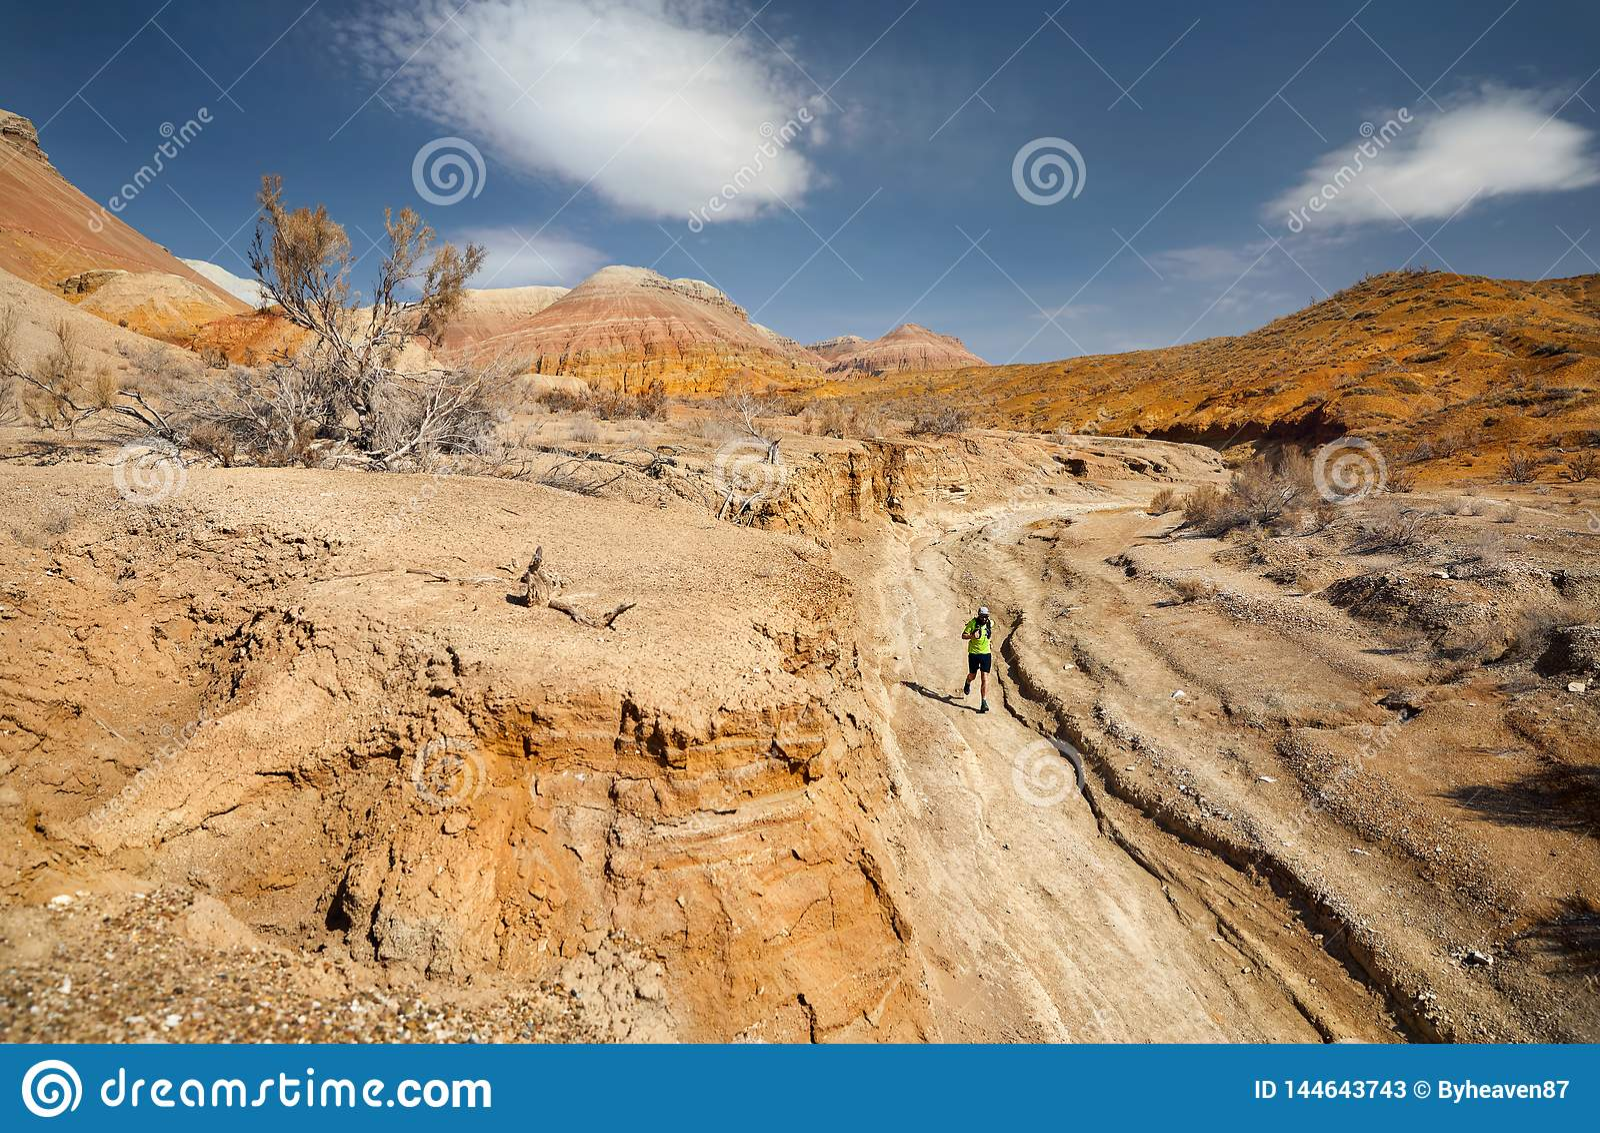 Trail running adventure